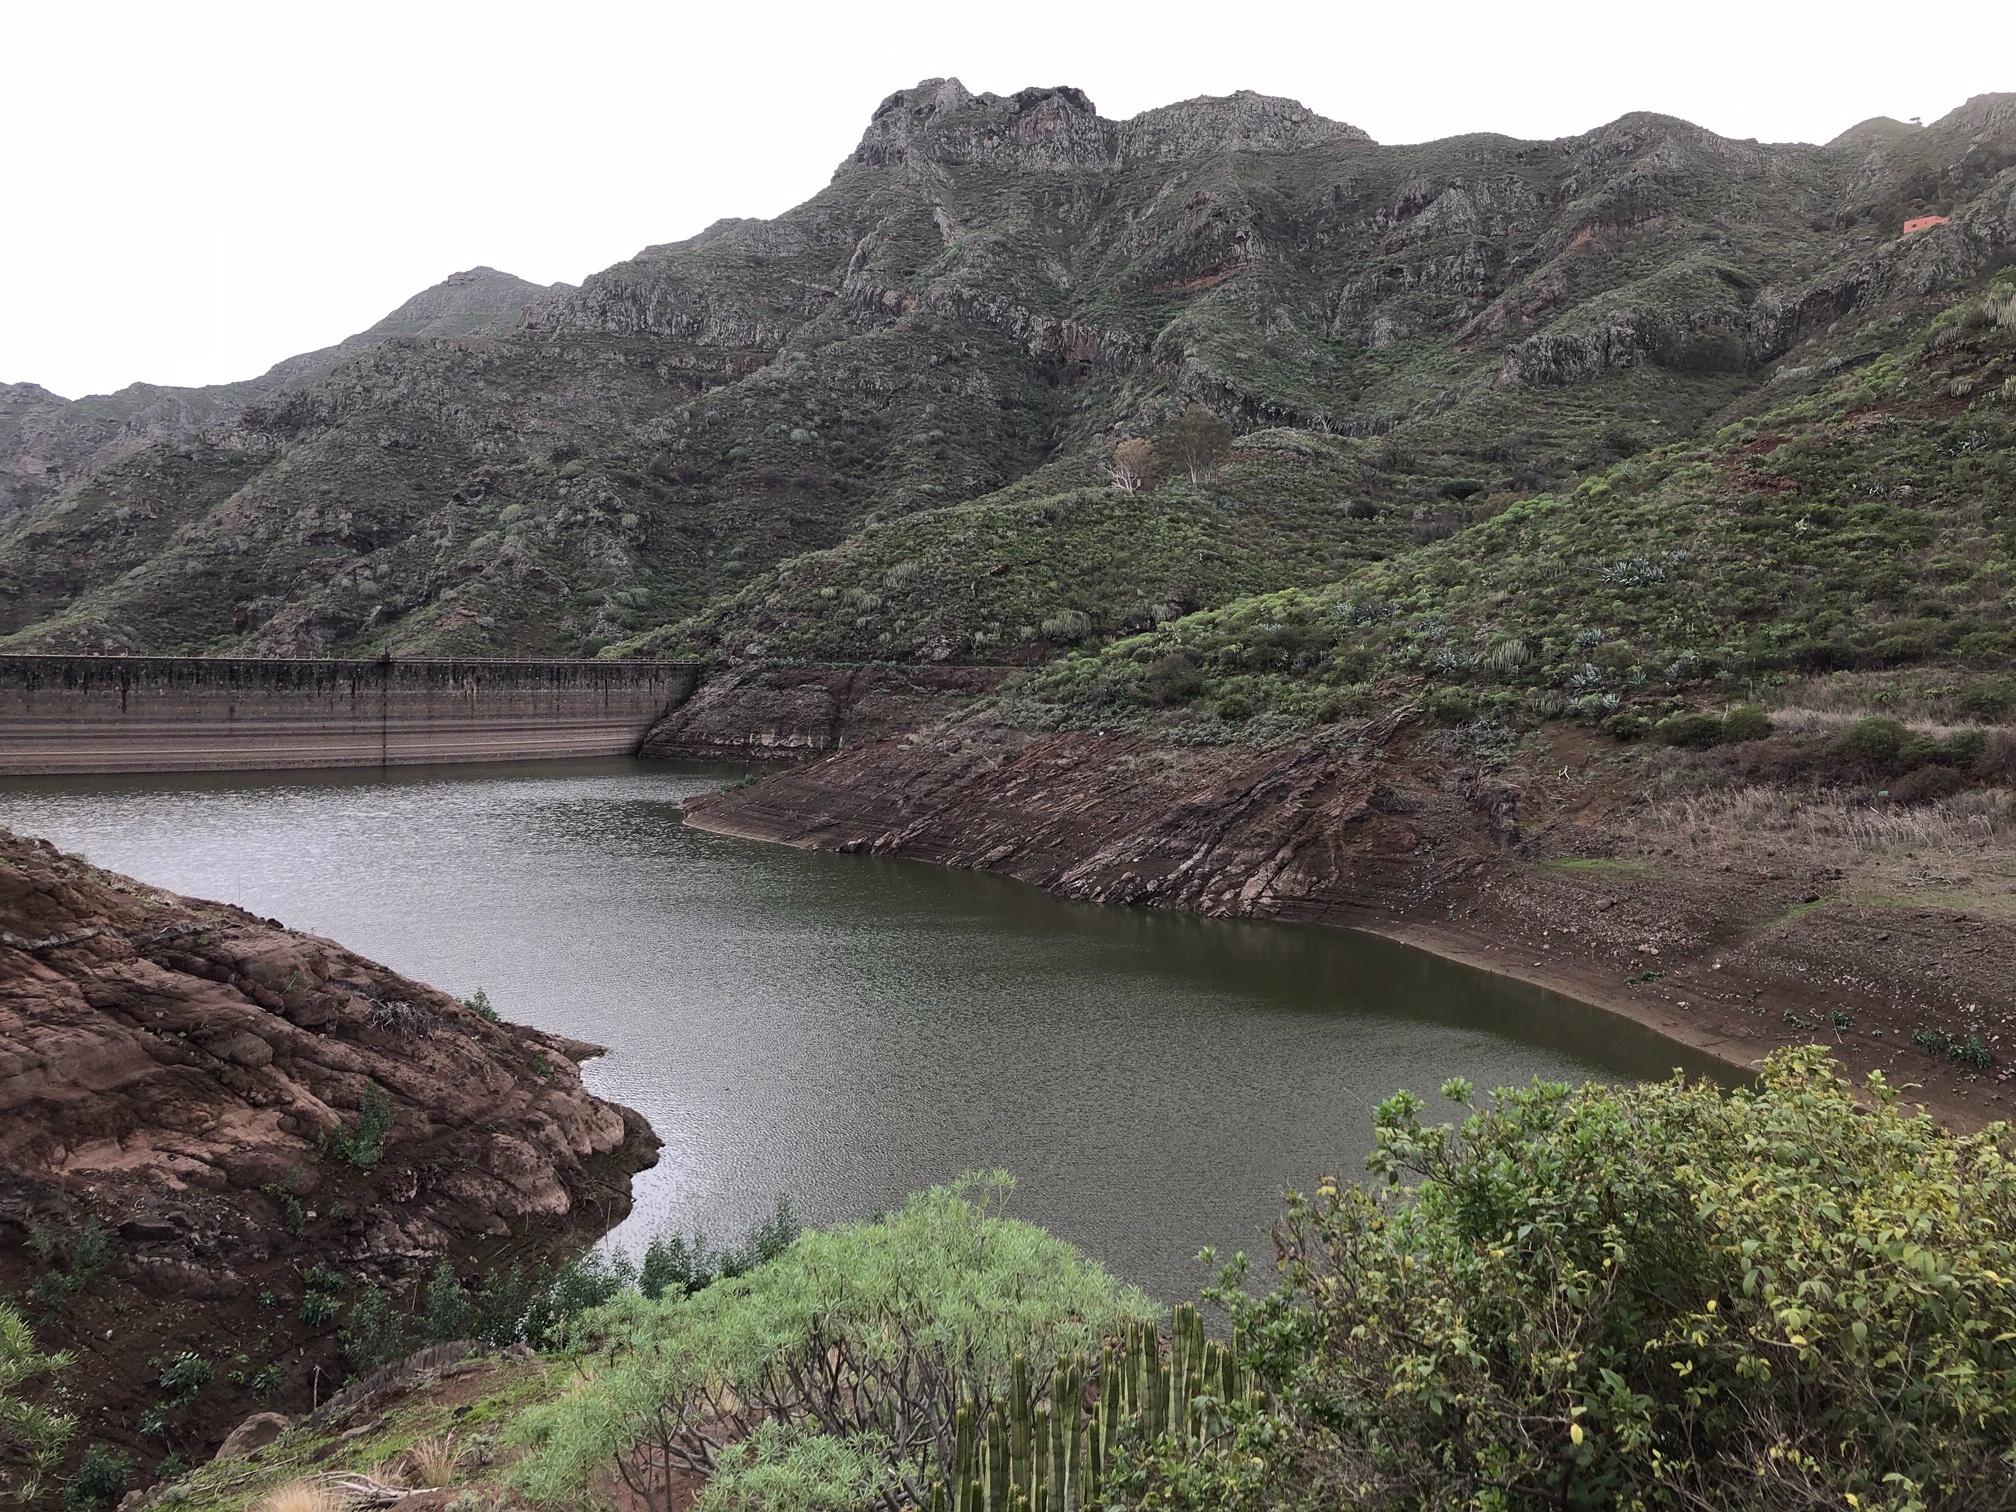 Barranco e Charca de Tahodio